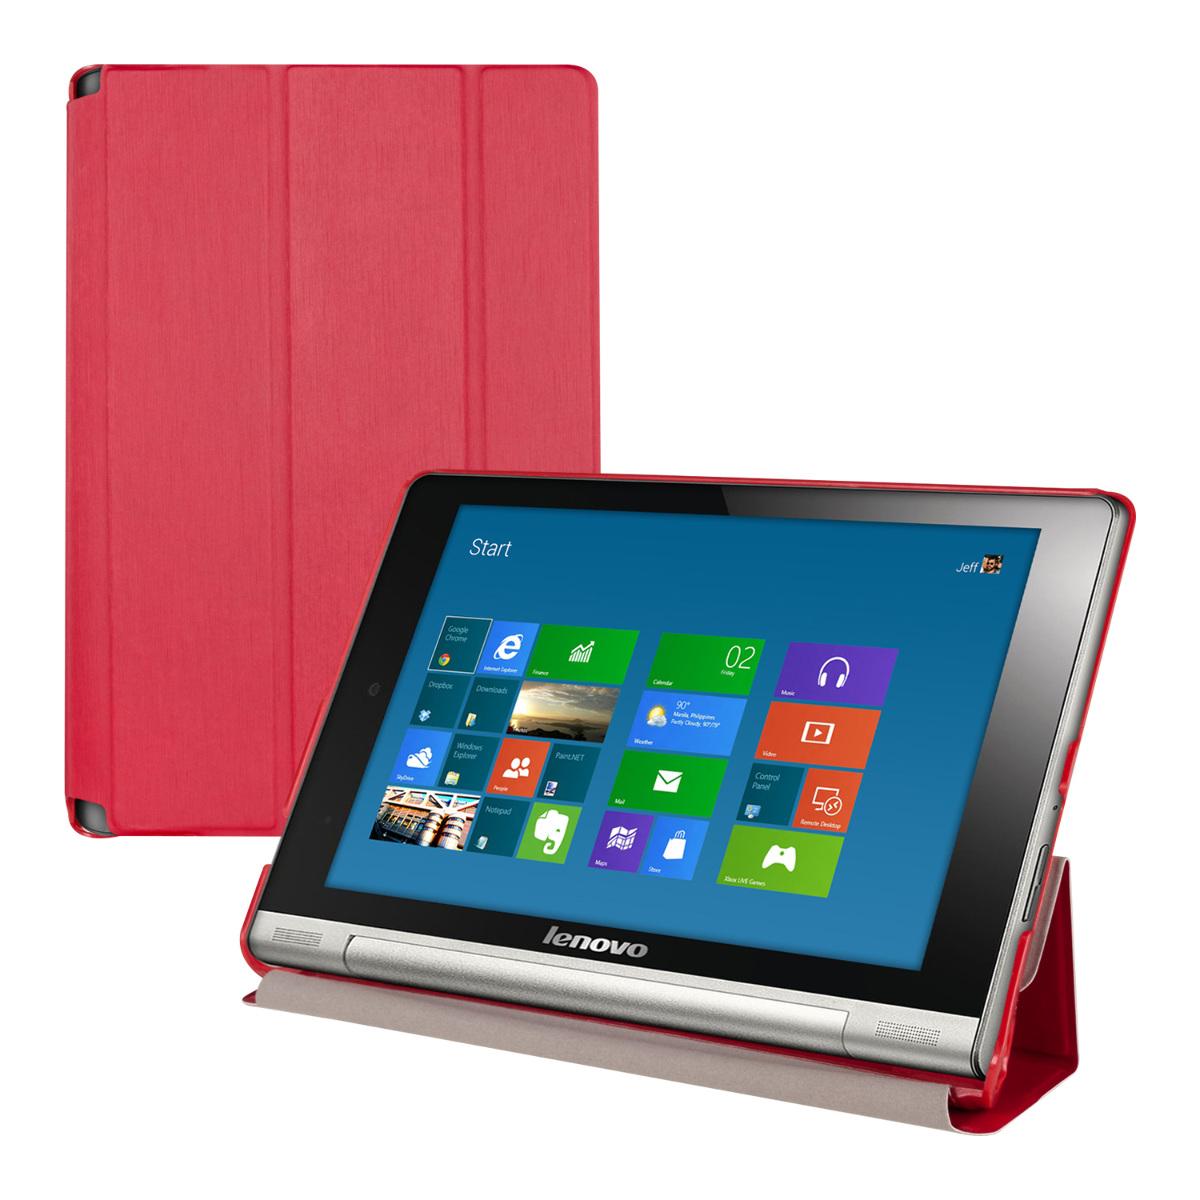 Funda para lenovo yoga tablet 8 rojo carcasa protectora - Funda protectora tablet ...